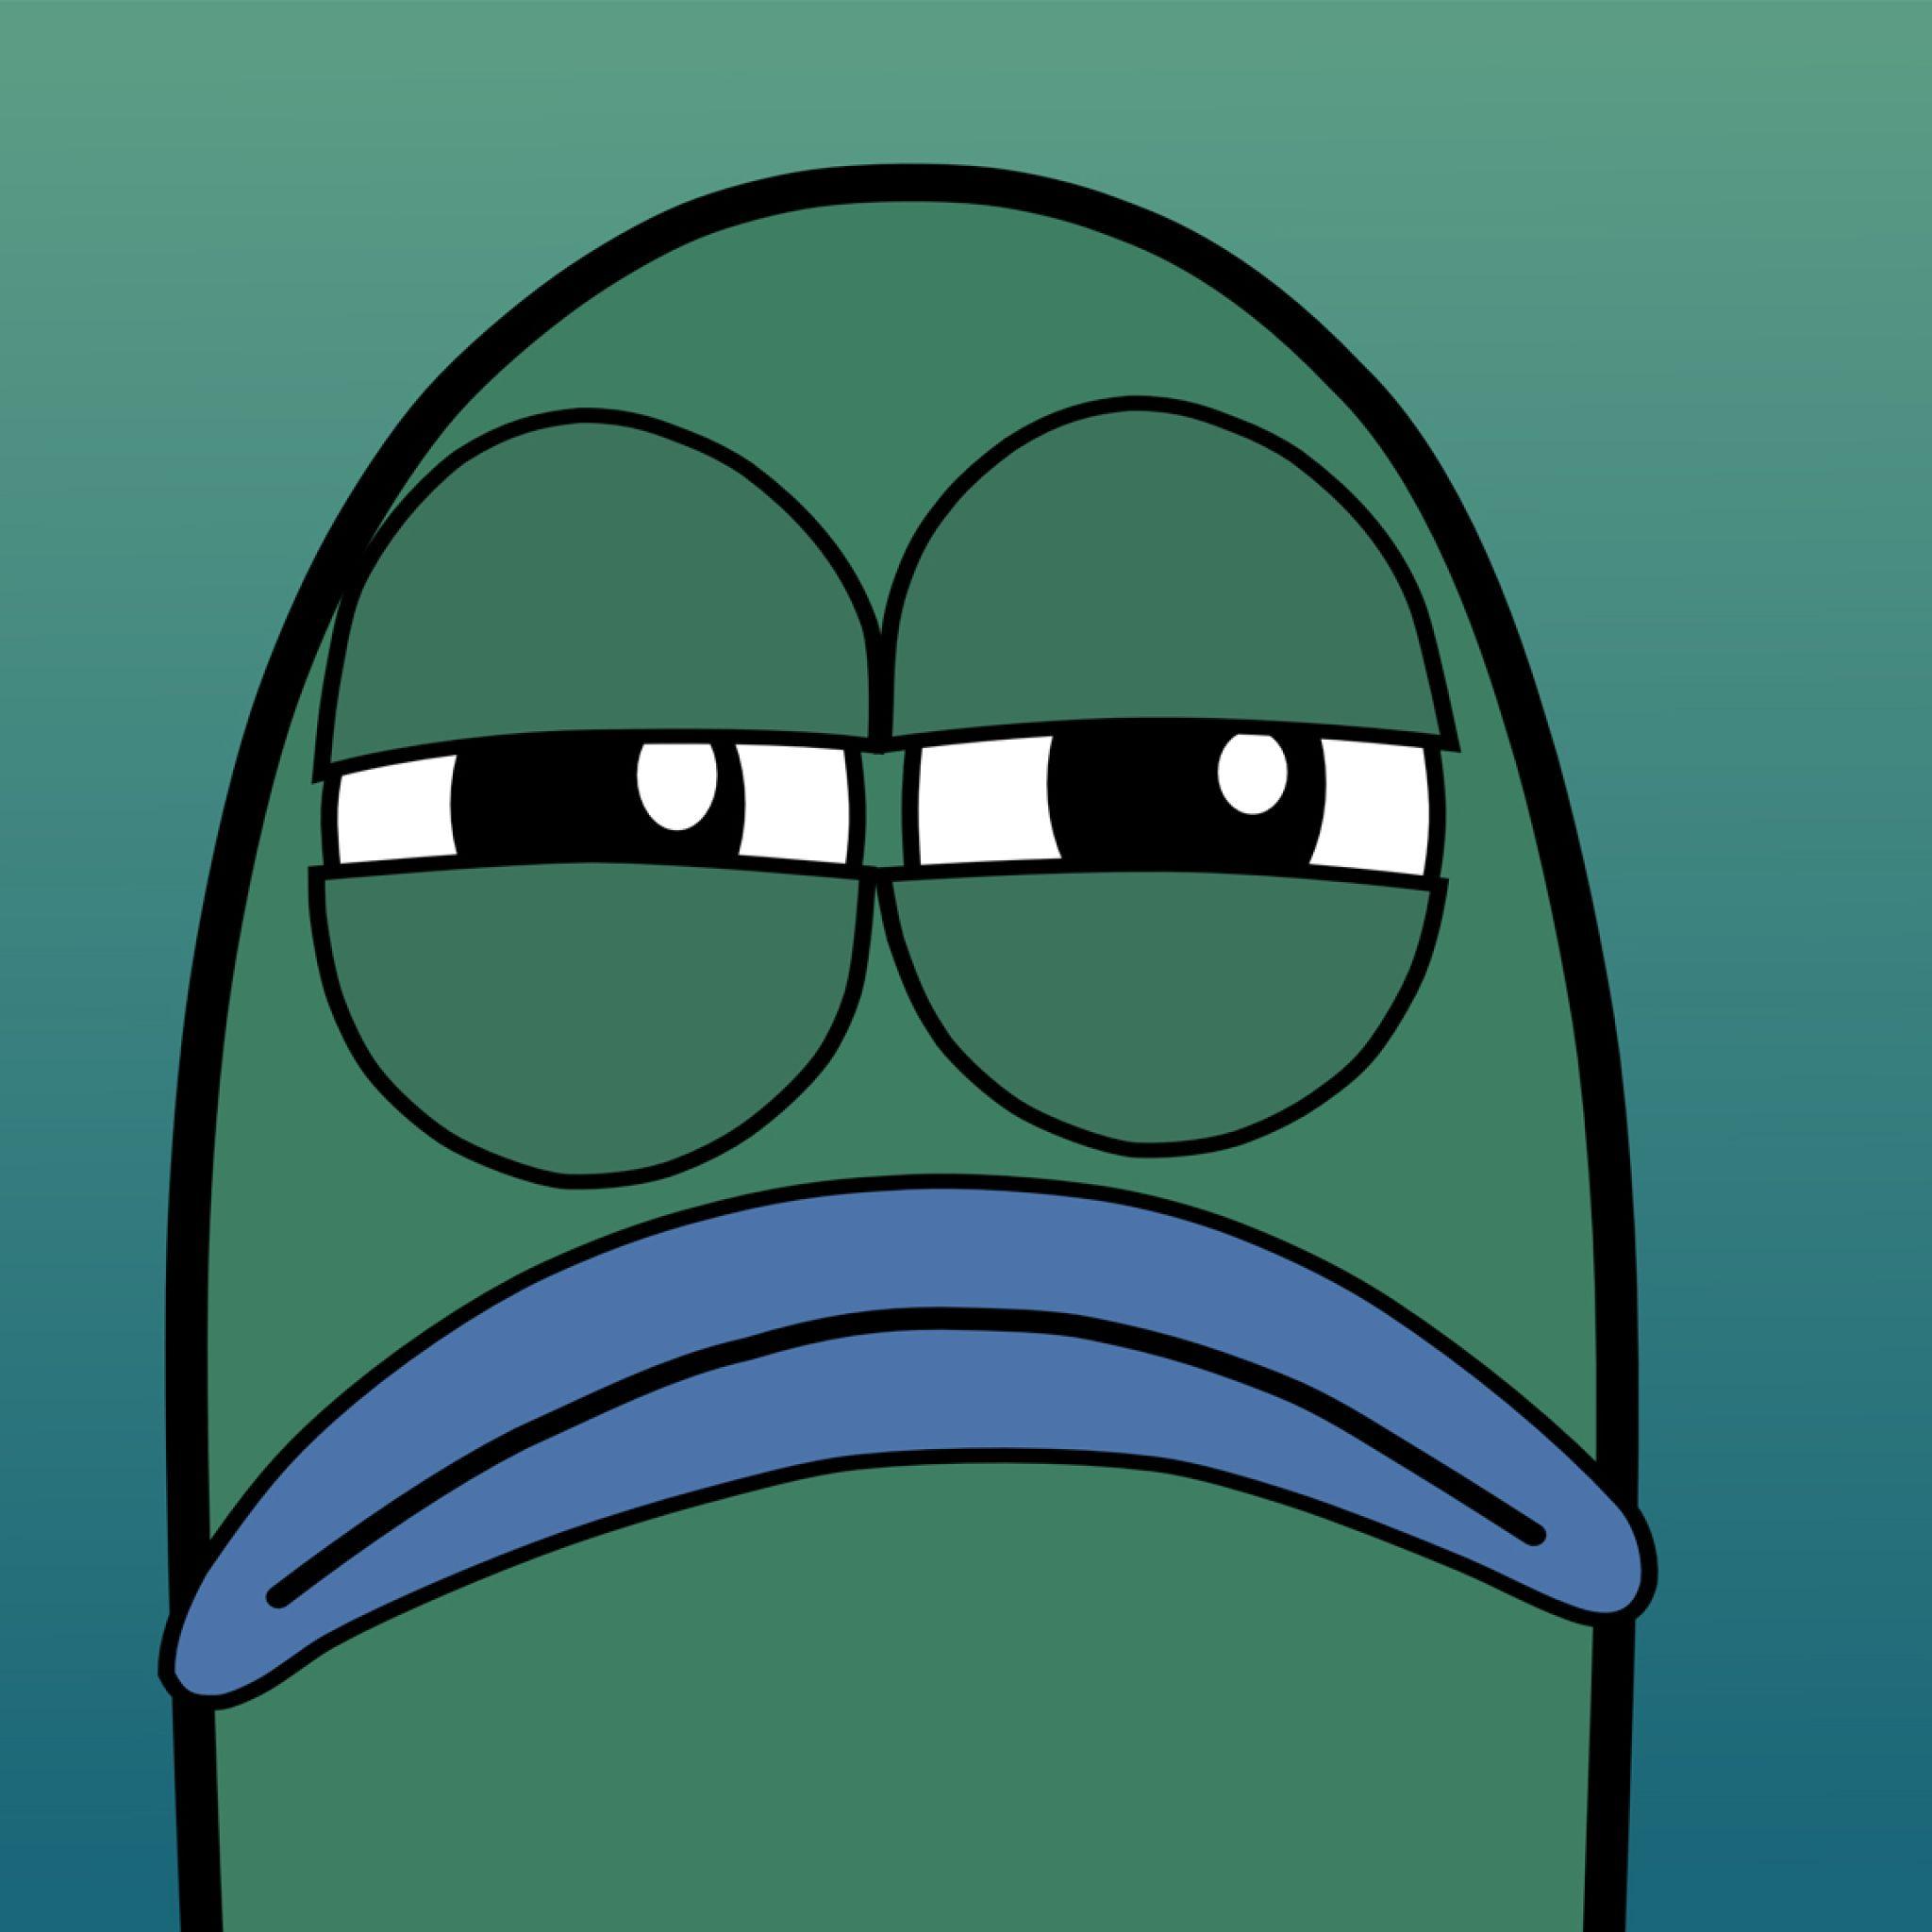 Cute Dinosaur Sheldon Wallpaper Sad Funny Cute Plankton Face Tap To See More Simple